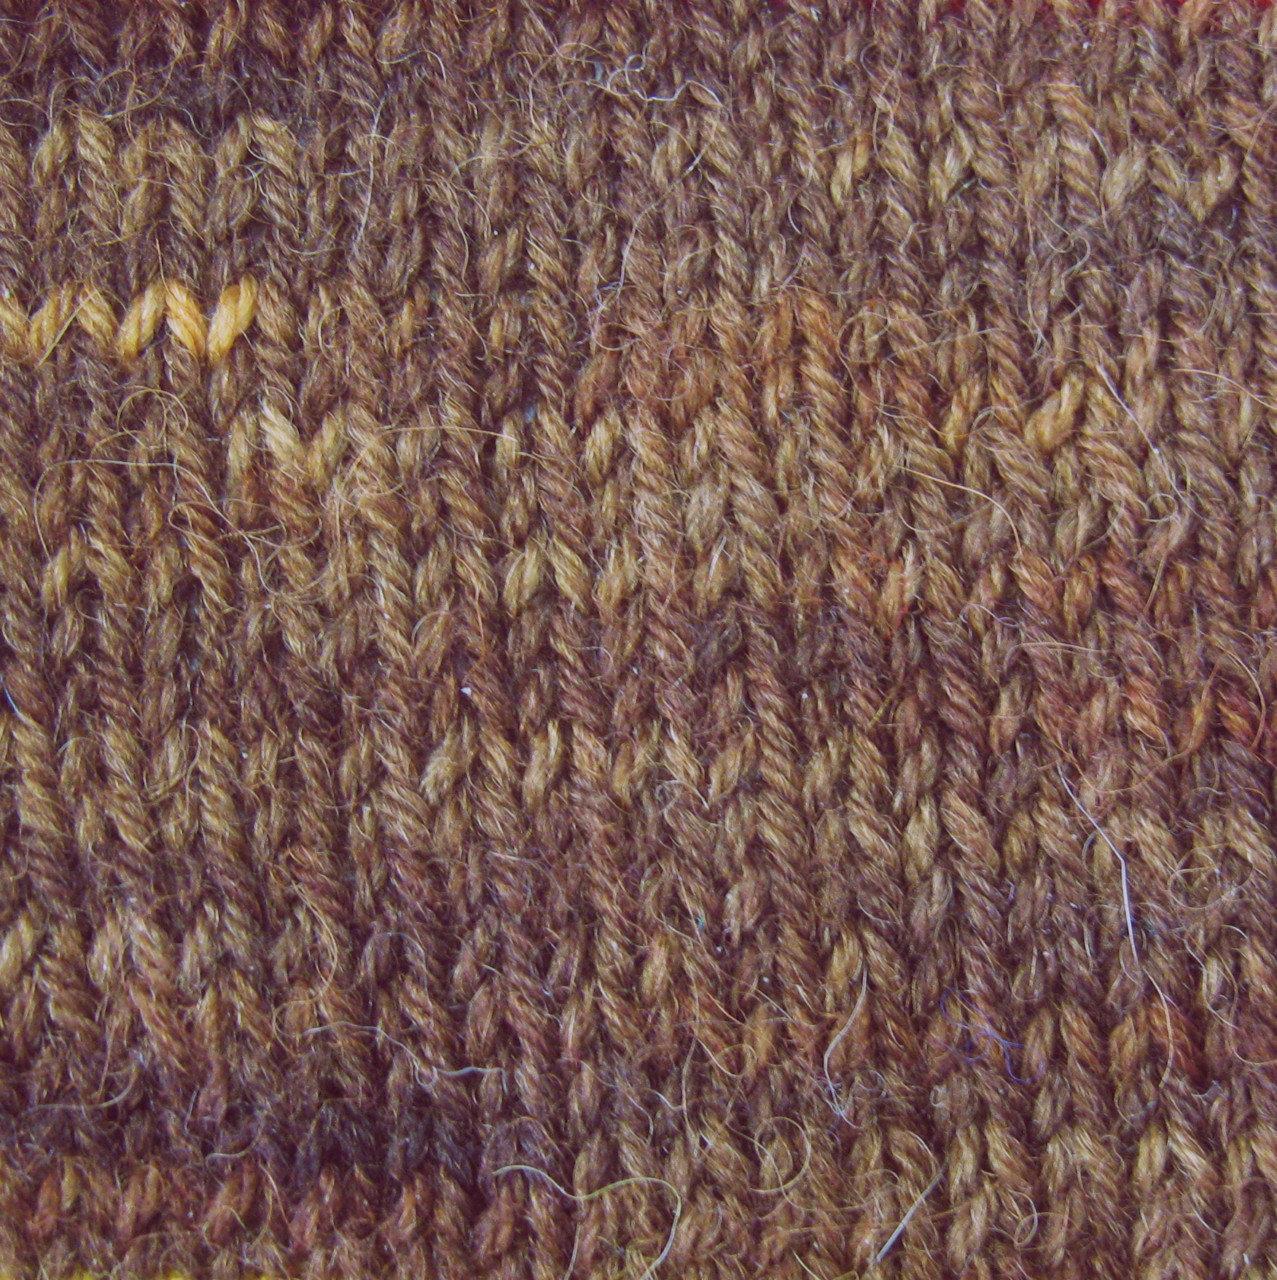 Alpaca and Superwash Wool Sock Yarn - Burled Walnut